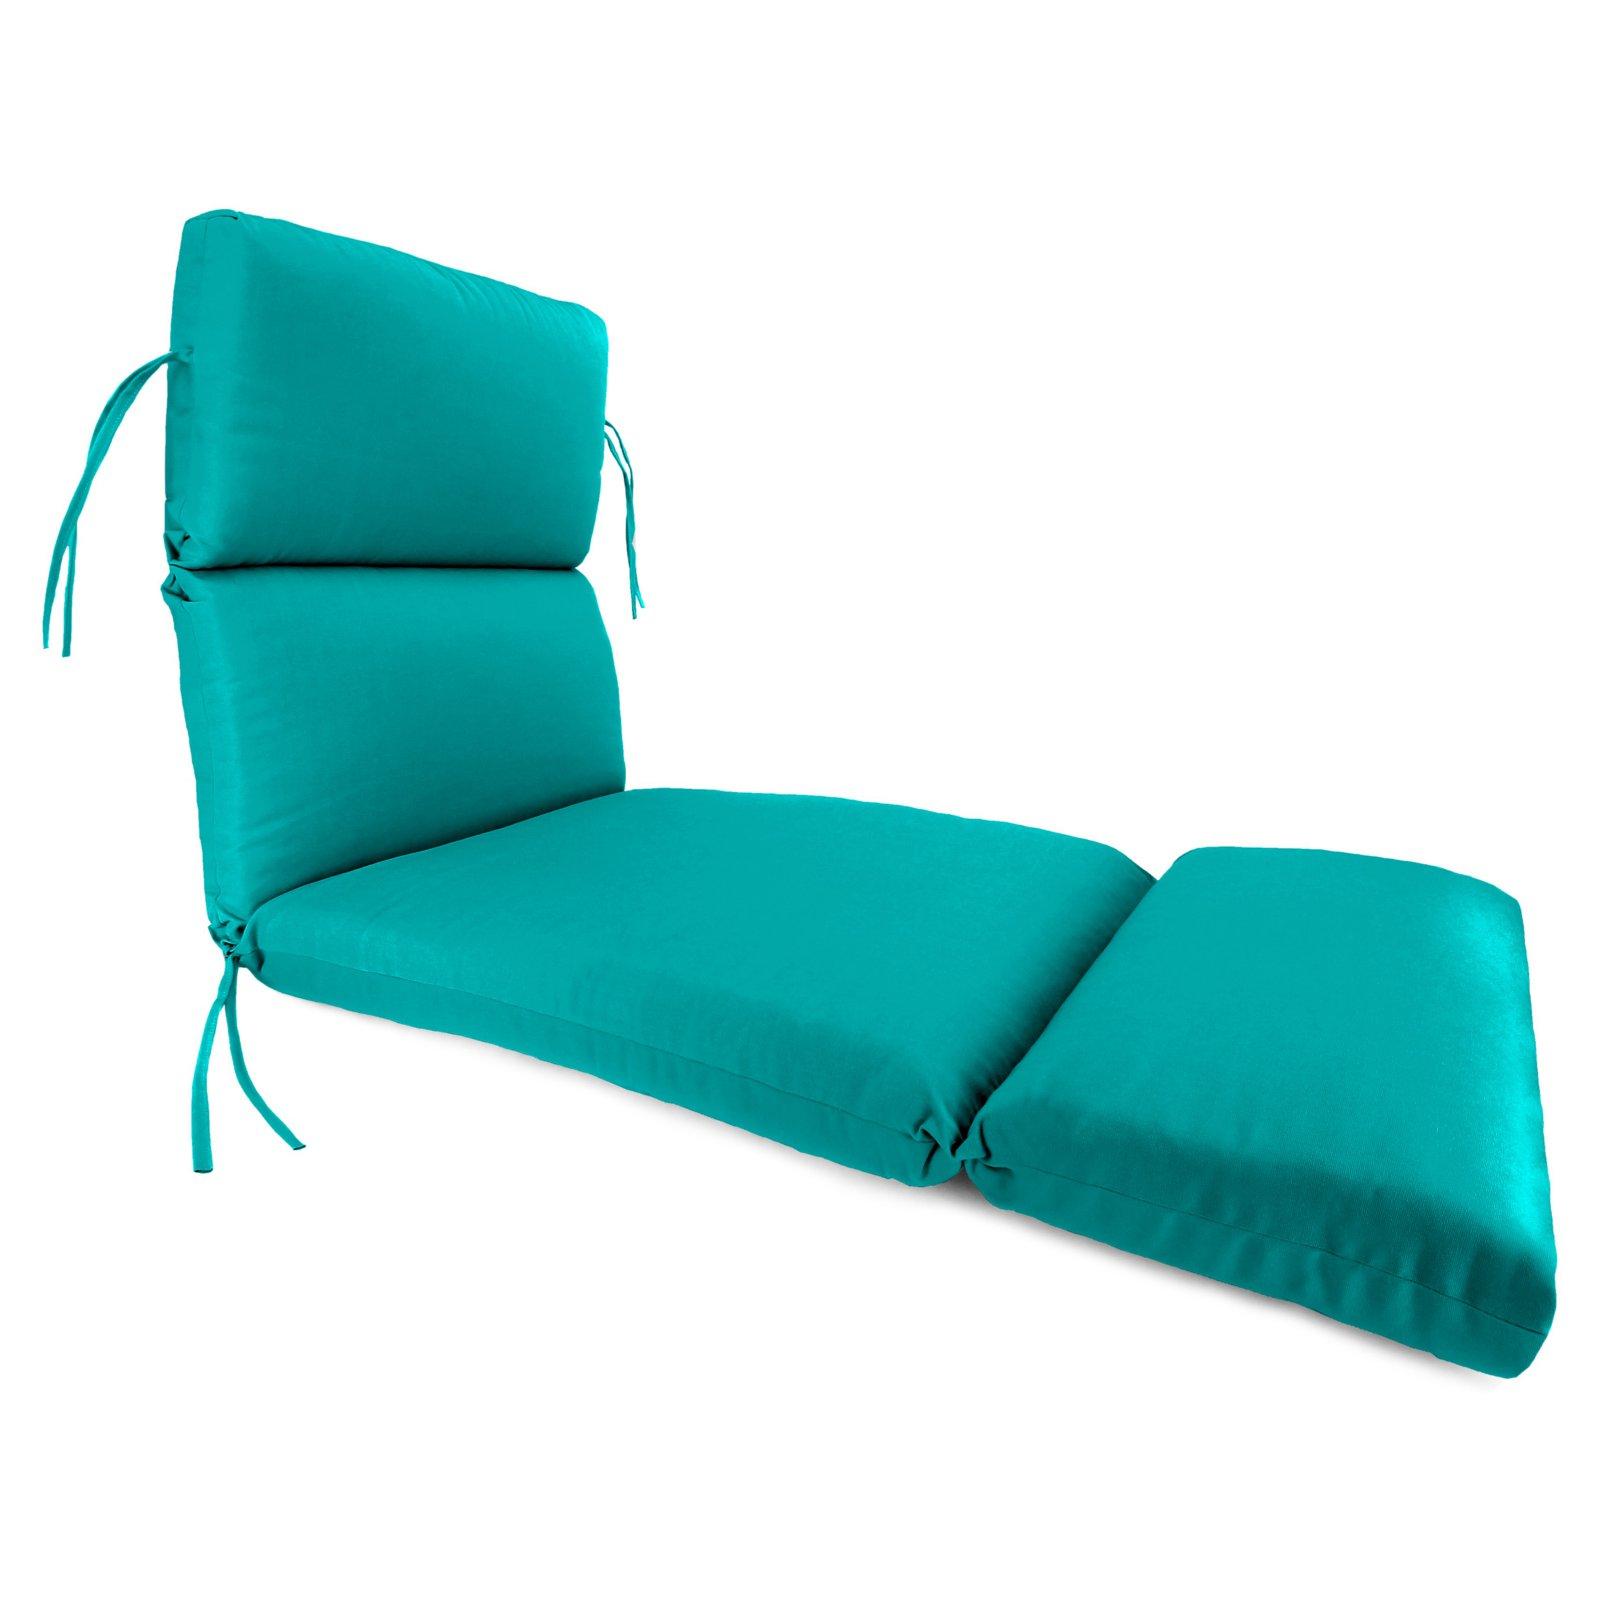 Jordan Manufacturing Sunbrella 74 x 23 in. Chaise Cushion